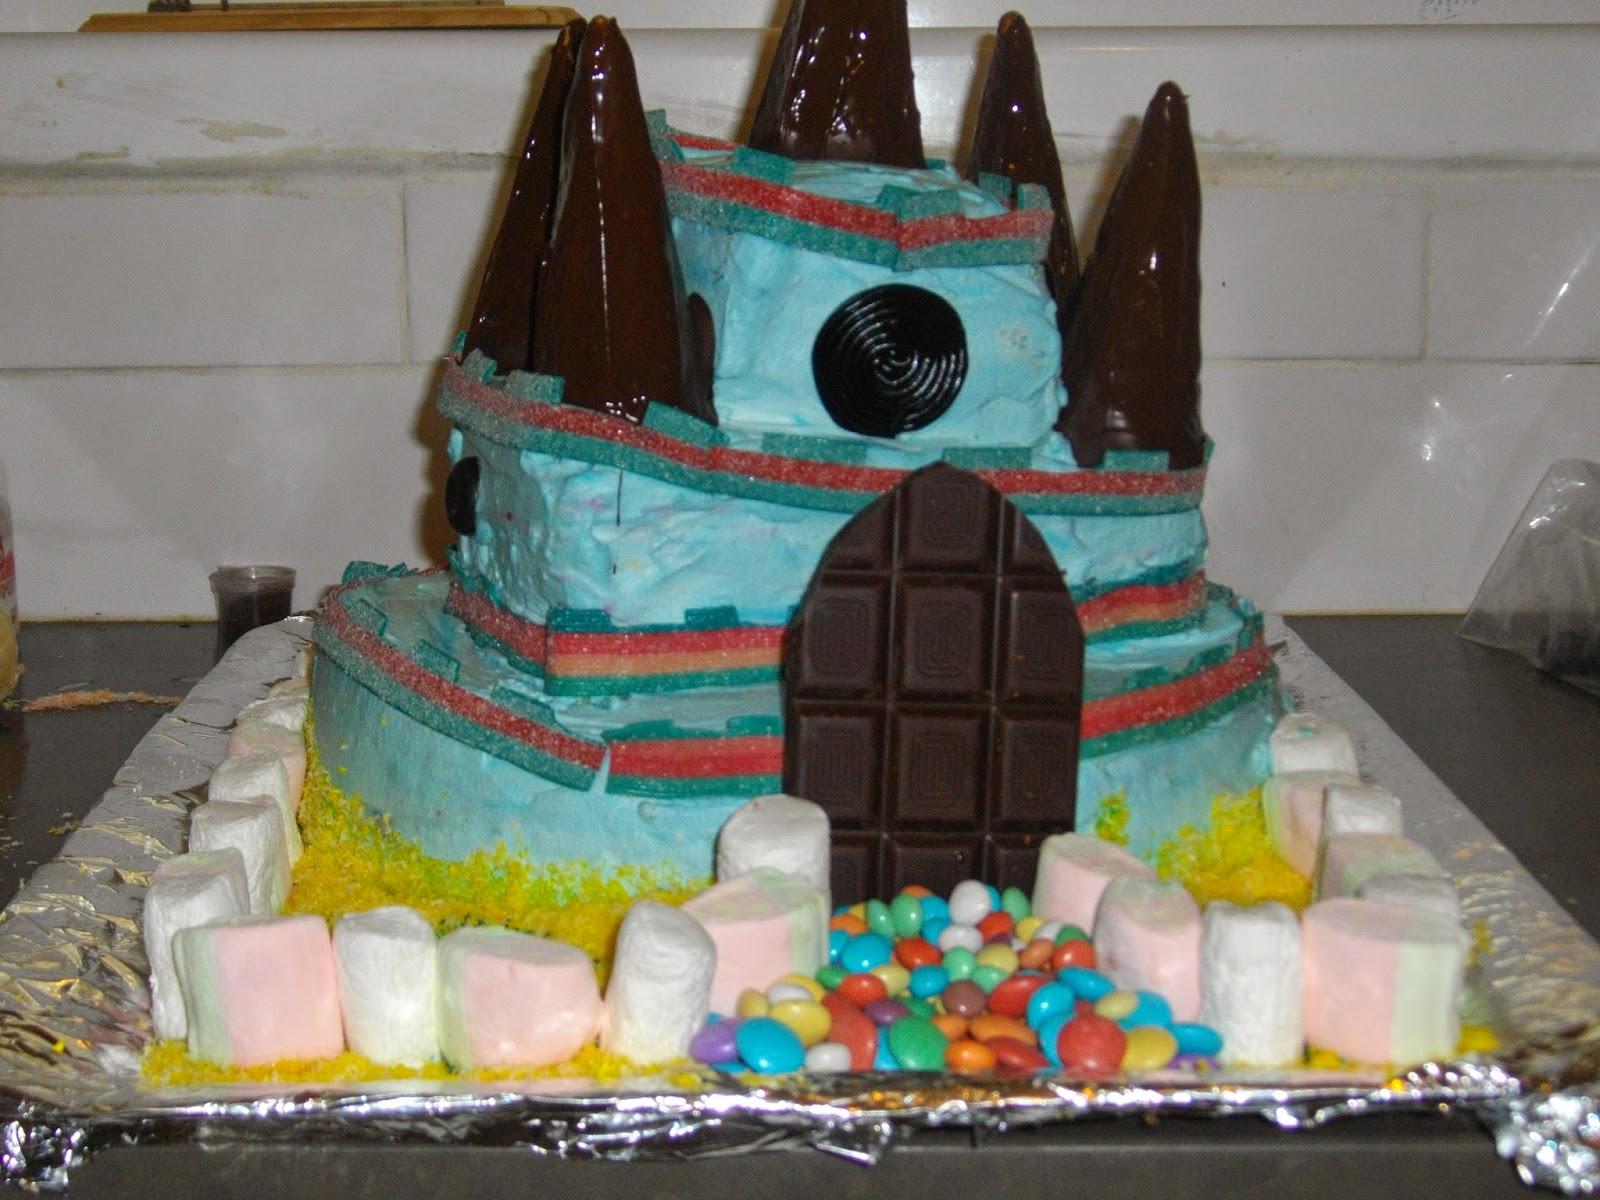 IMGP2879 - עוגת יומולדת בצורת ארמון